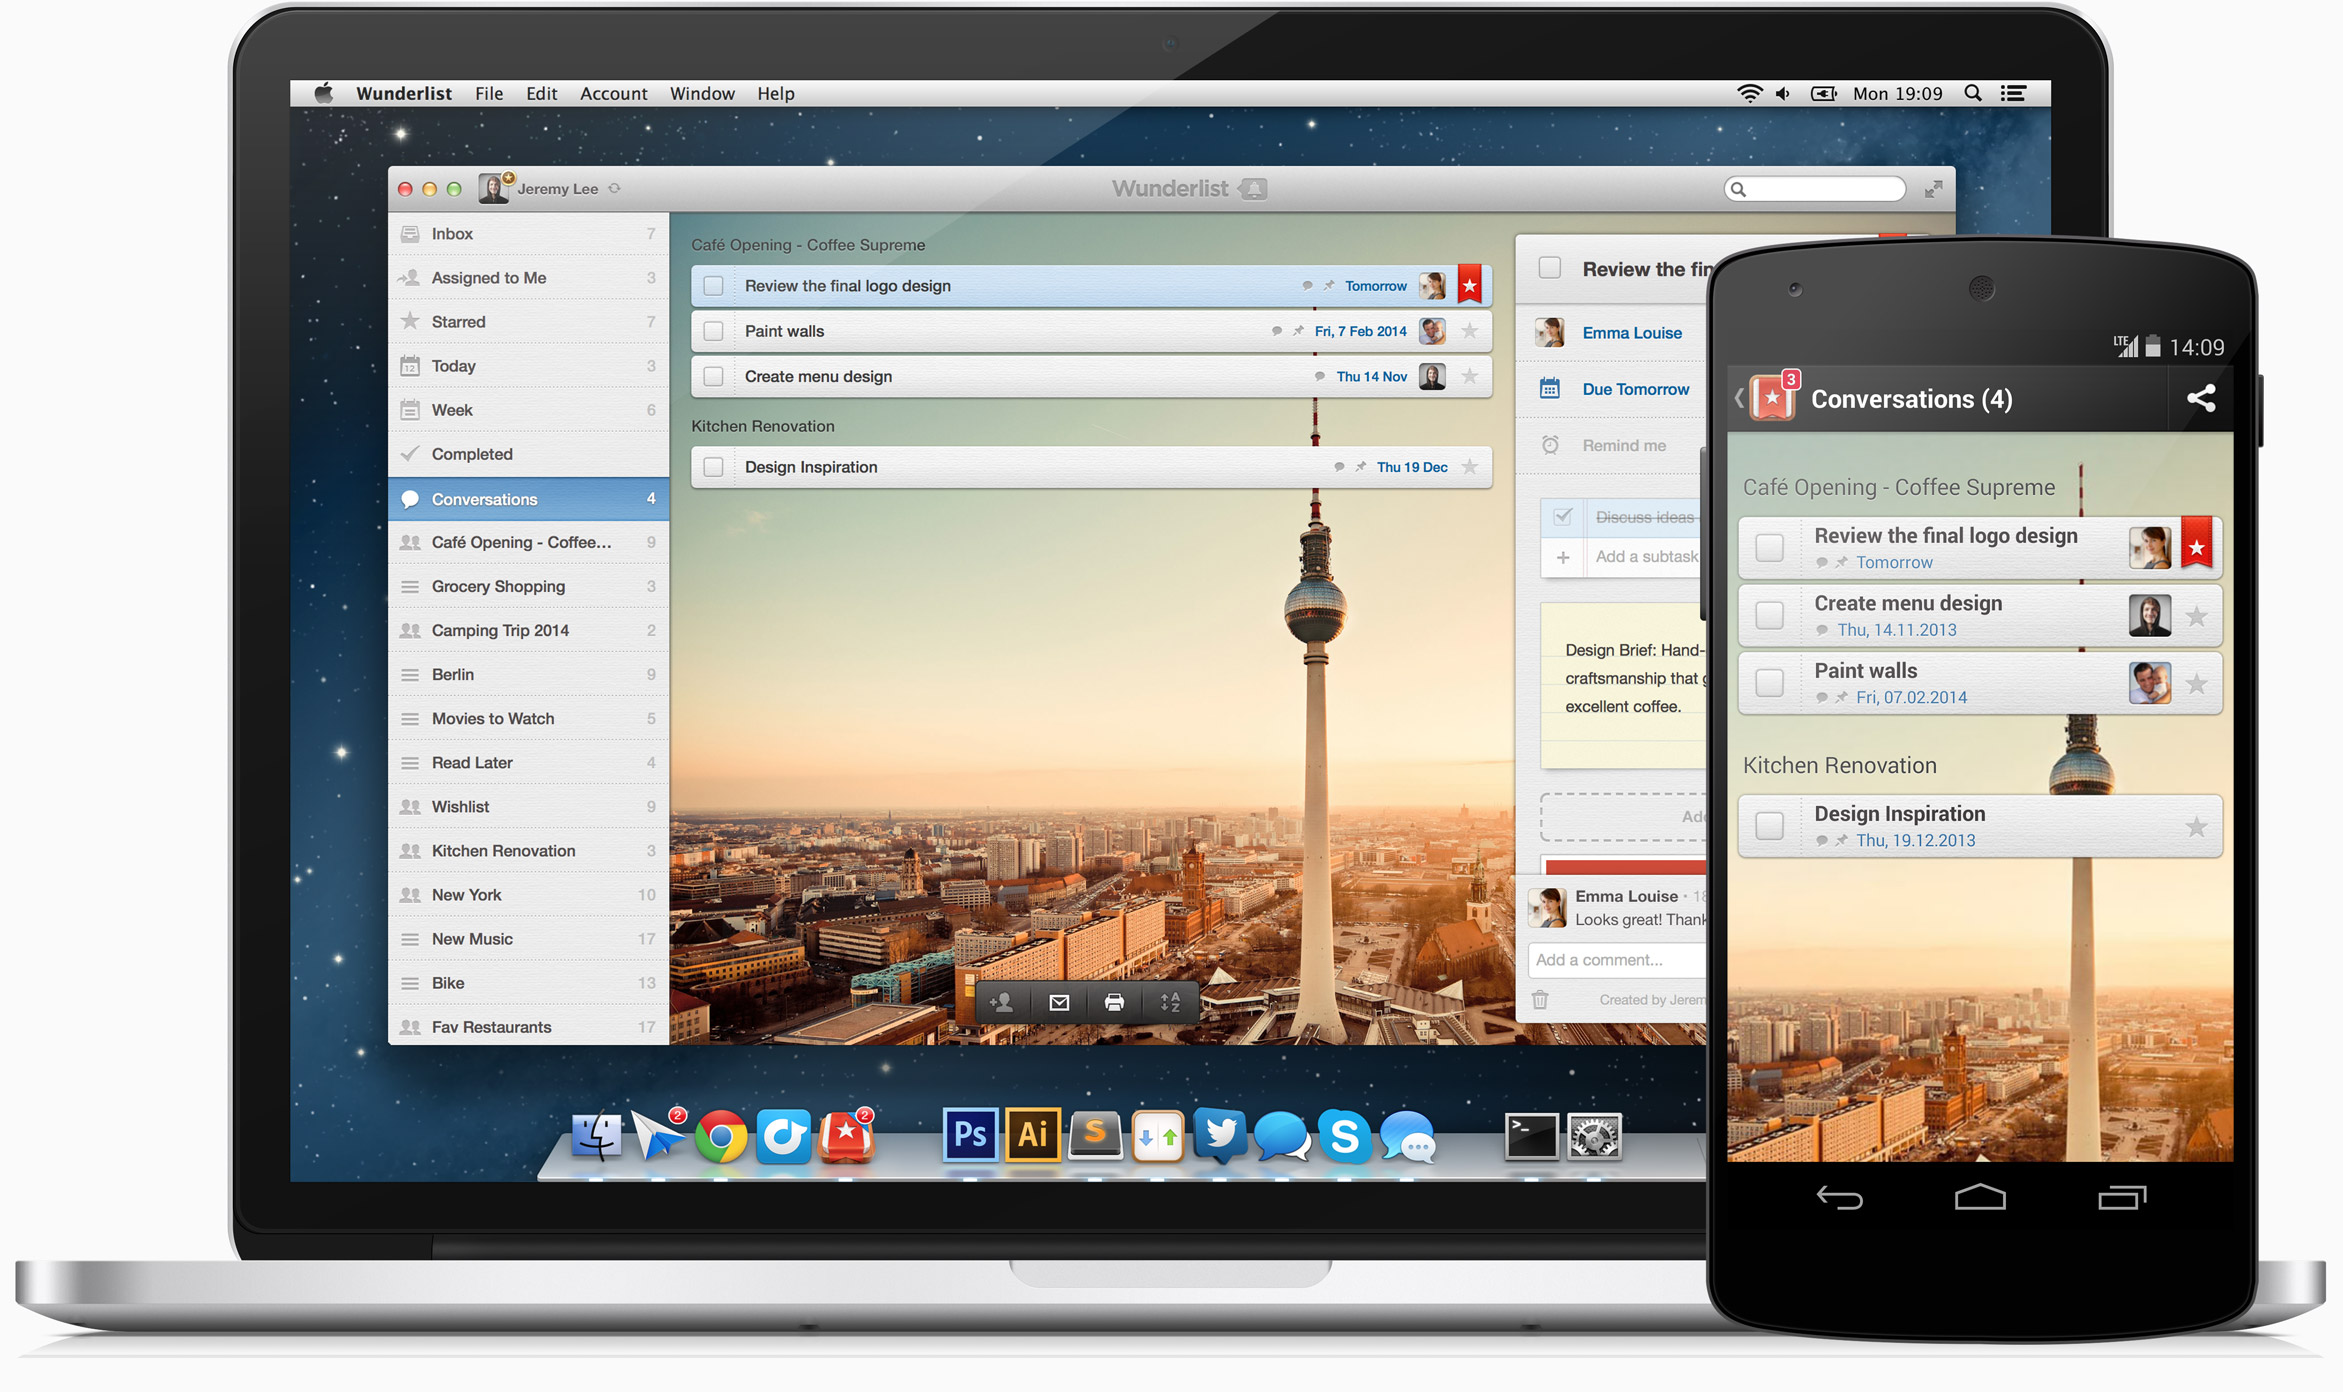 wunderlist online work management application